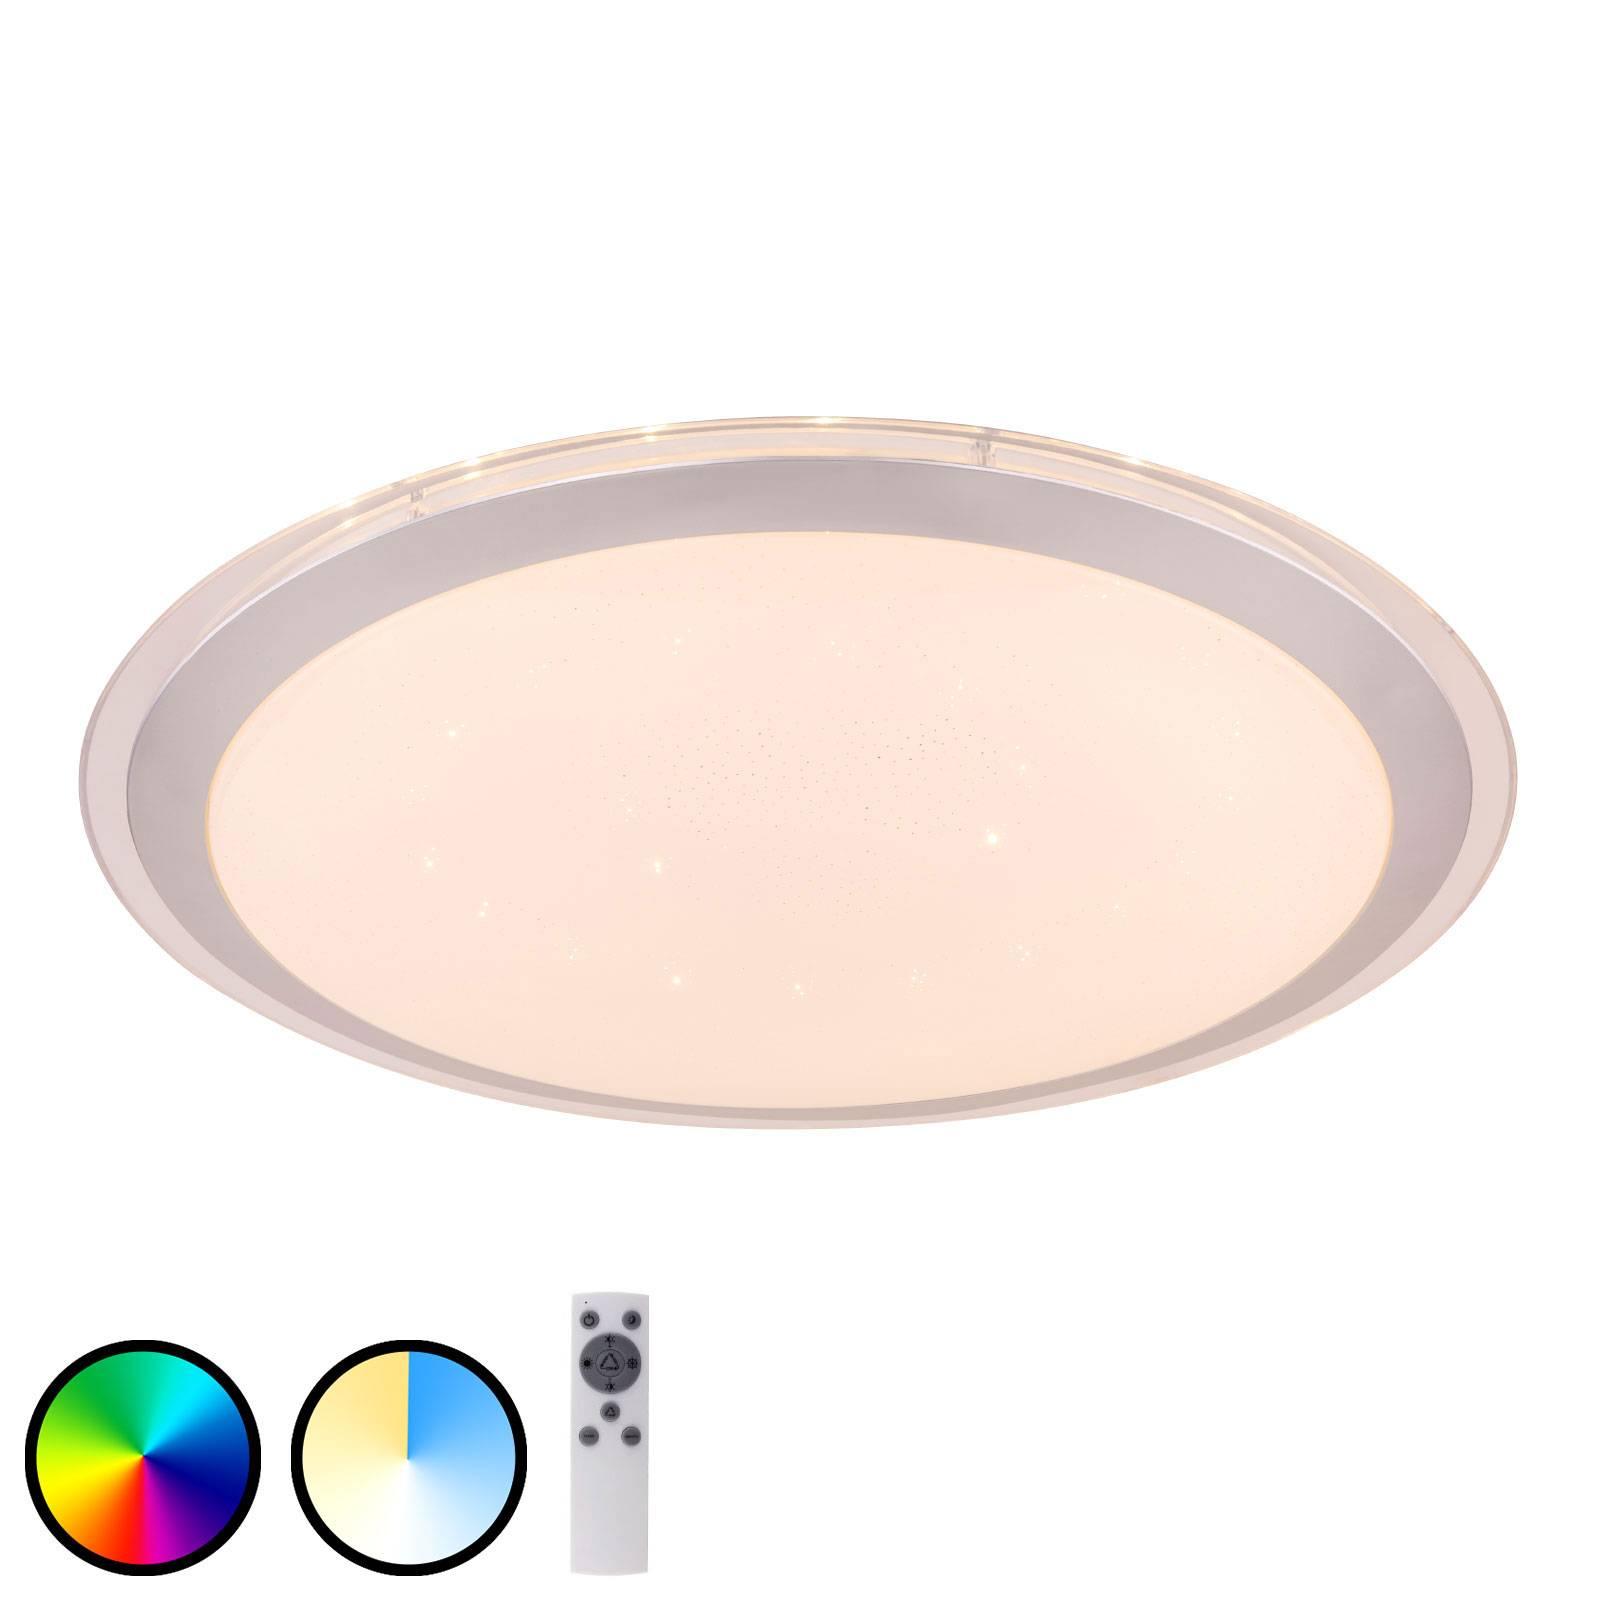 Lampa sufitowa LED Carry Tuya-Smart RGBW CCT